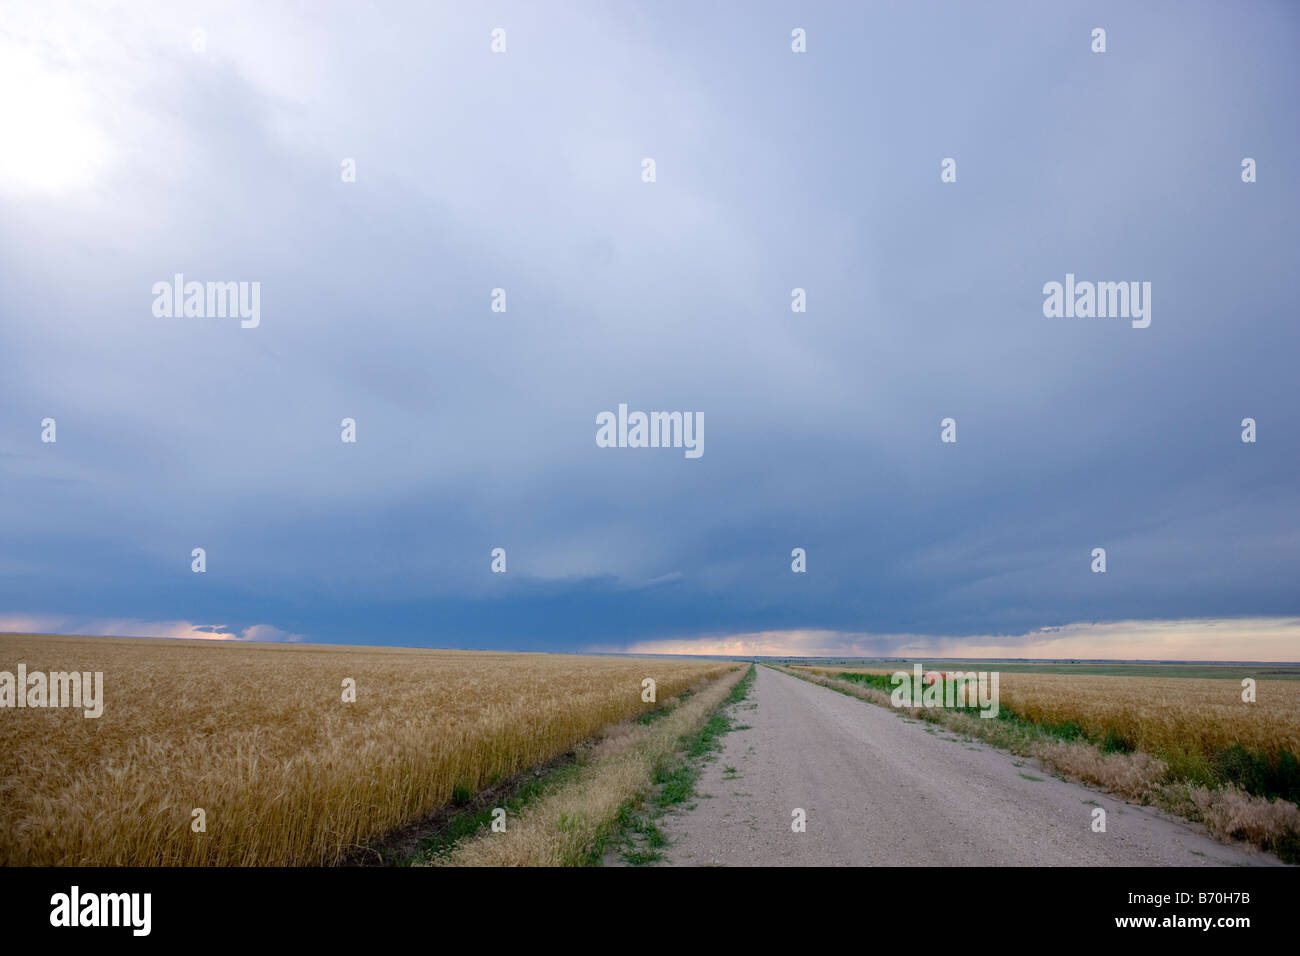 Road and wheat field in Wakeeney Kansas - Stock Image